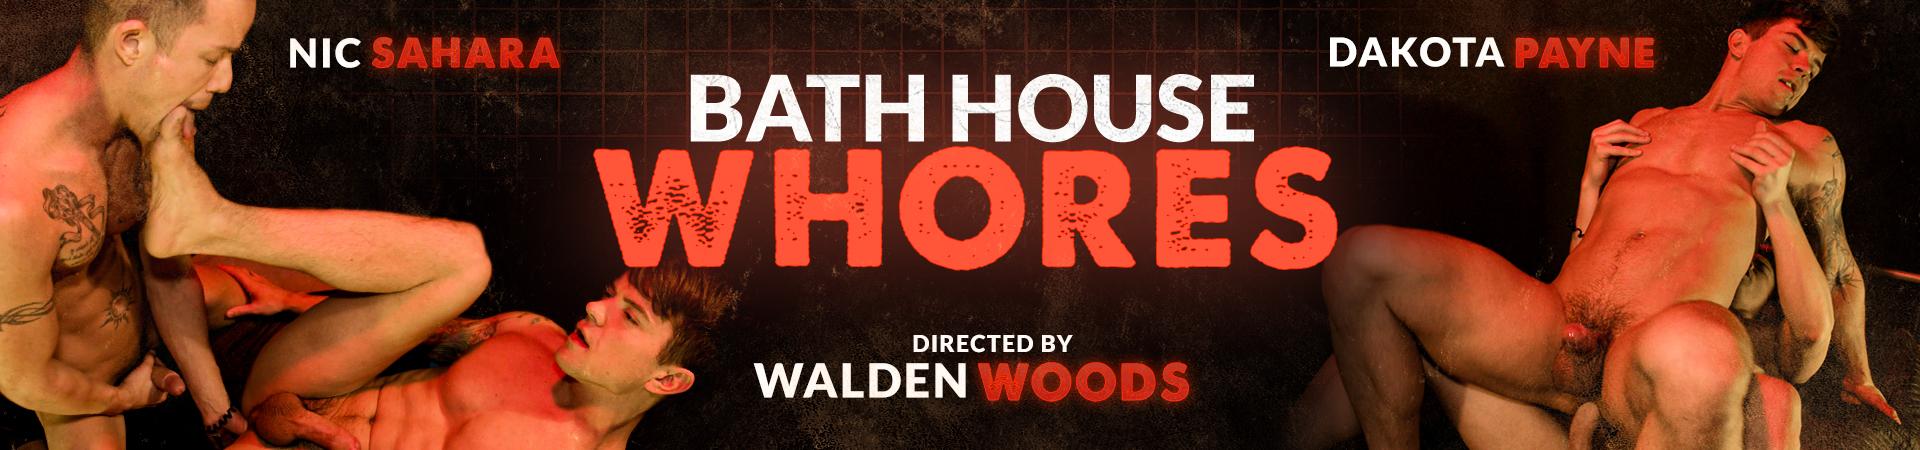 Bath House Whores Featuring Dakota Payne and Nic Sahara